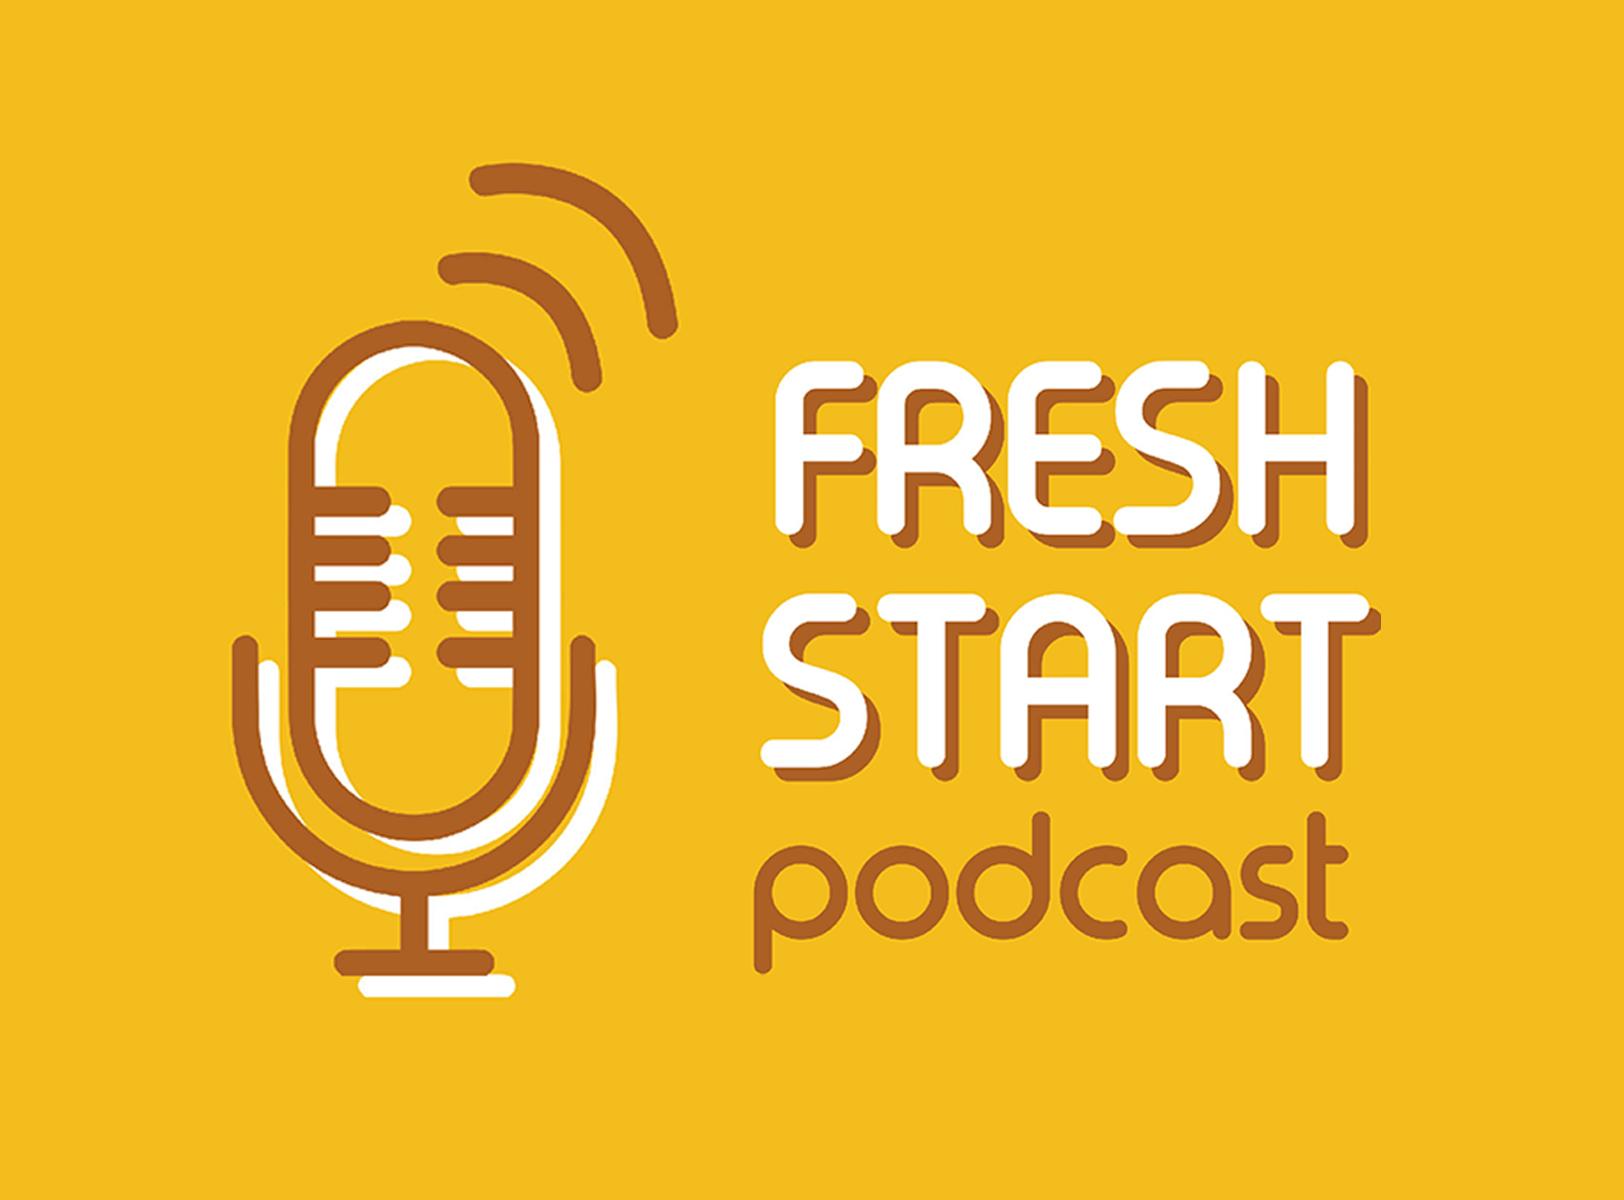 Fresh Start: Podcast News (10/10/2019 Thu.)